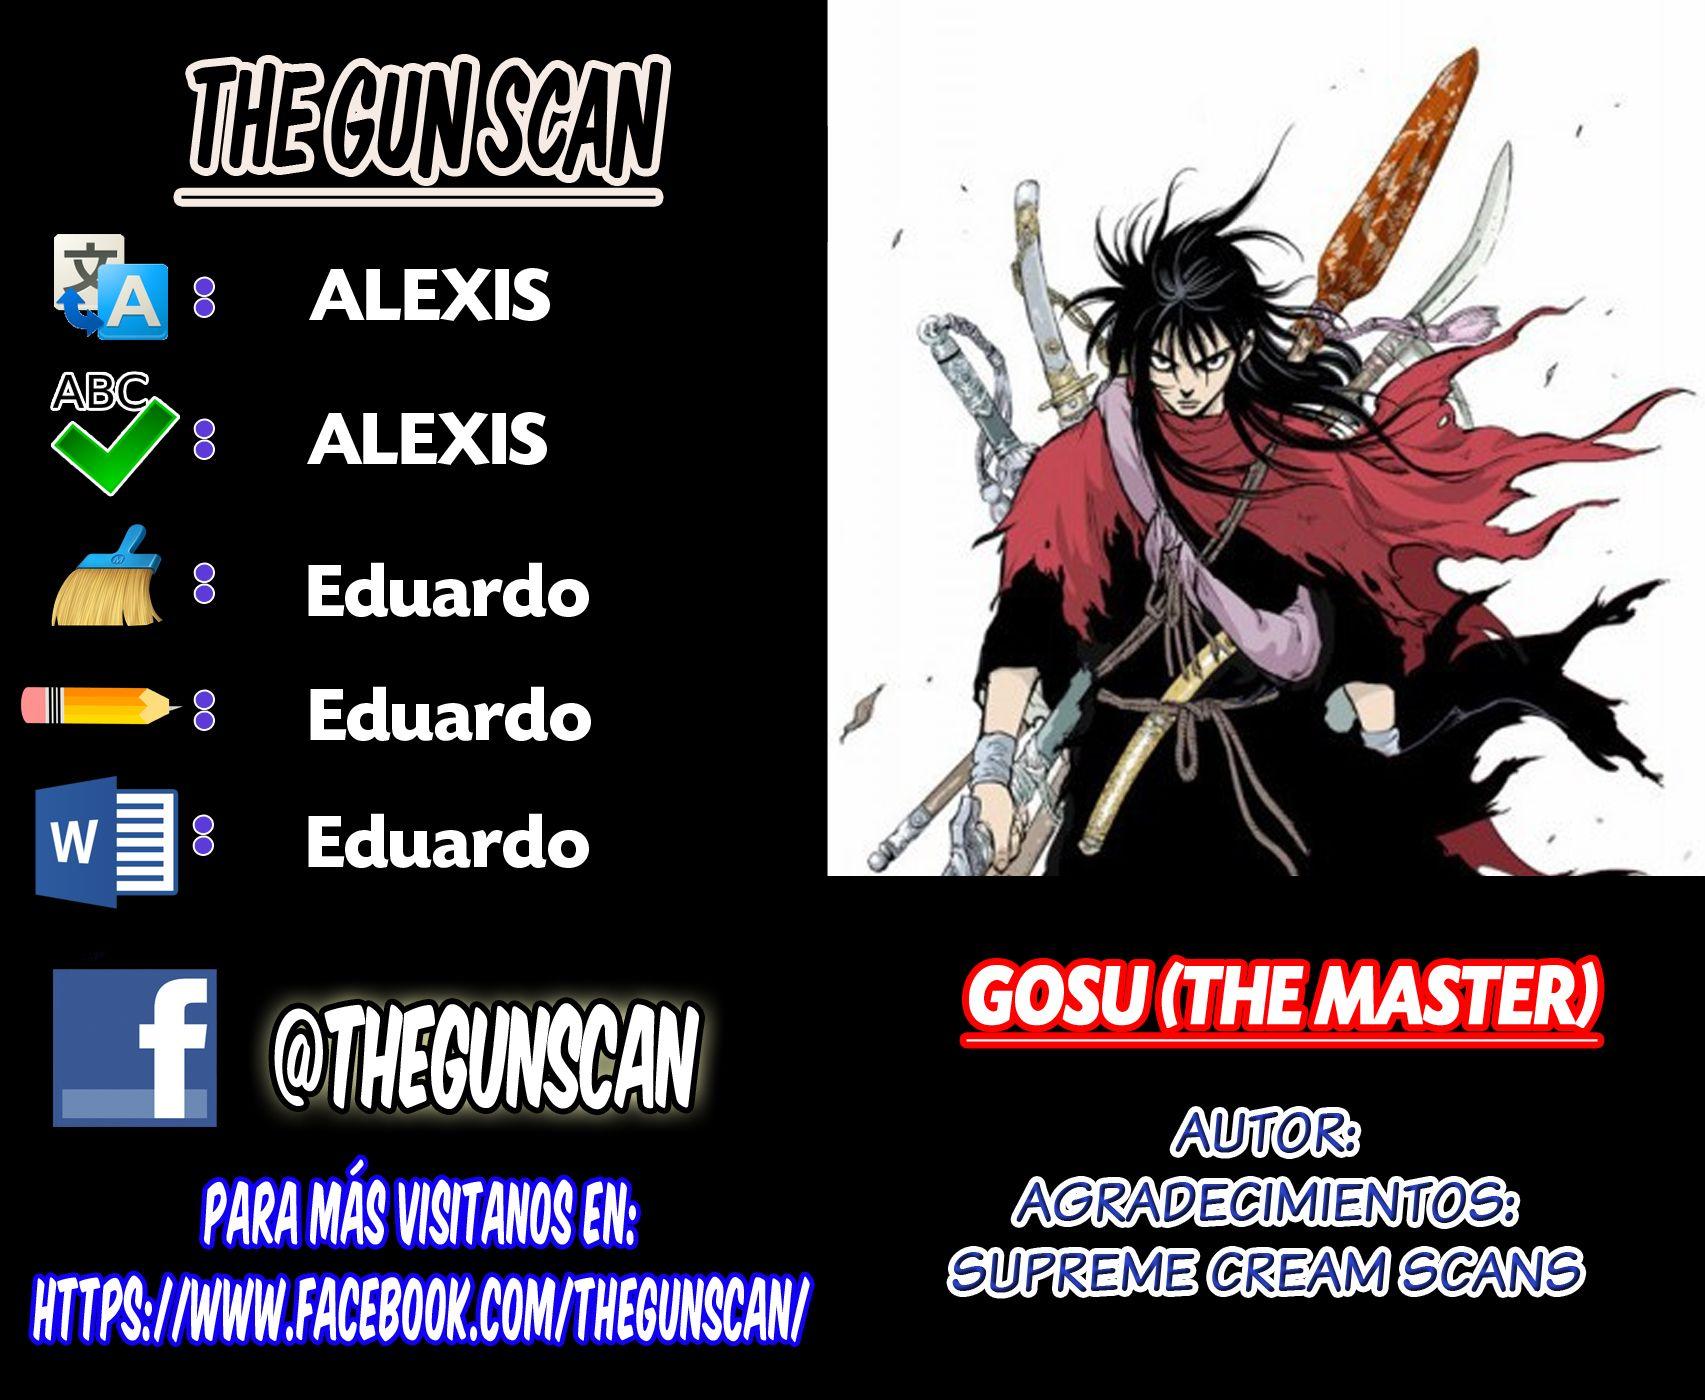 https://c5.ninemanga.com/es_manga/9/18249/486163/359b8db60f379d36511e28c04a3fb0b6.jpg Page 1